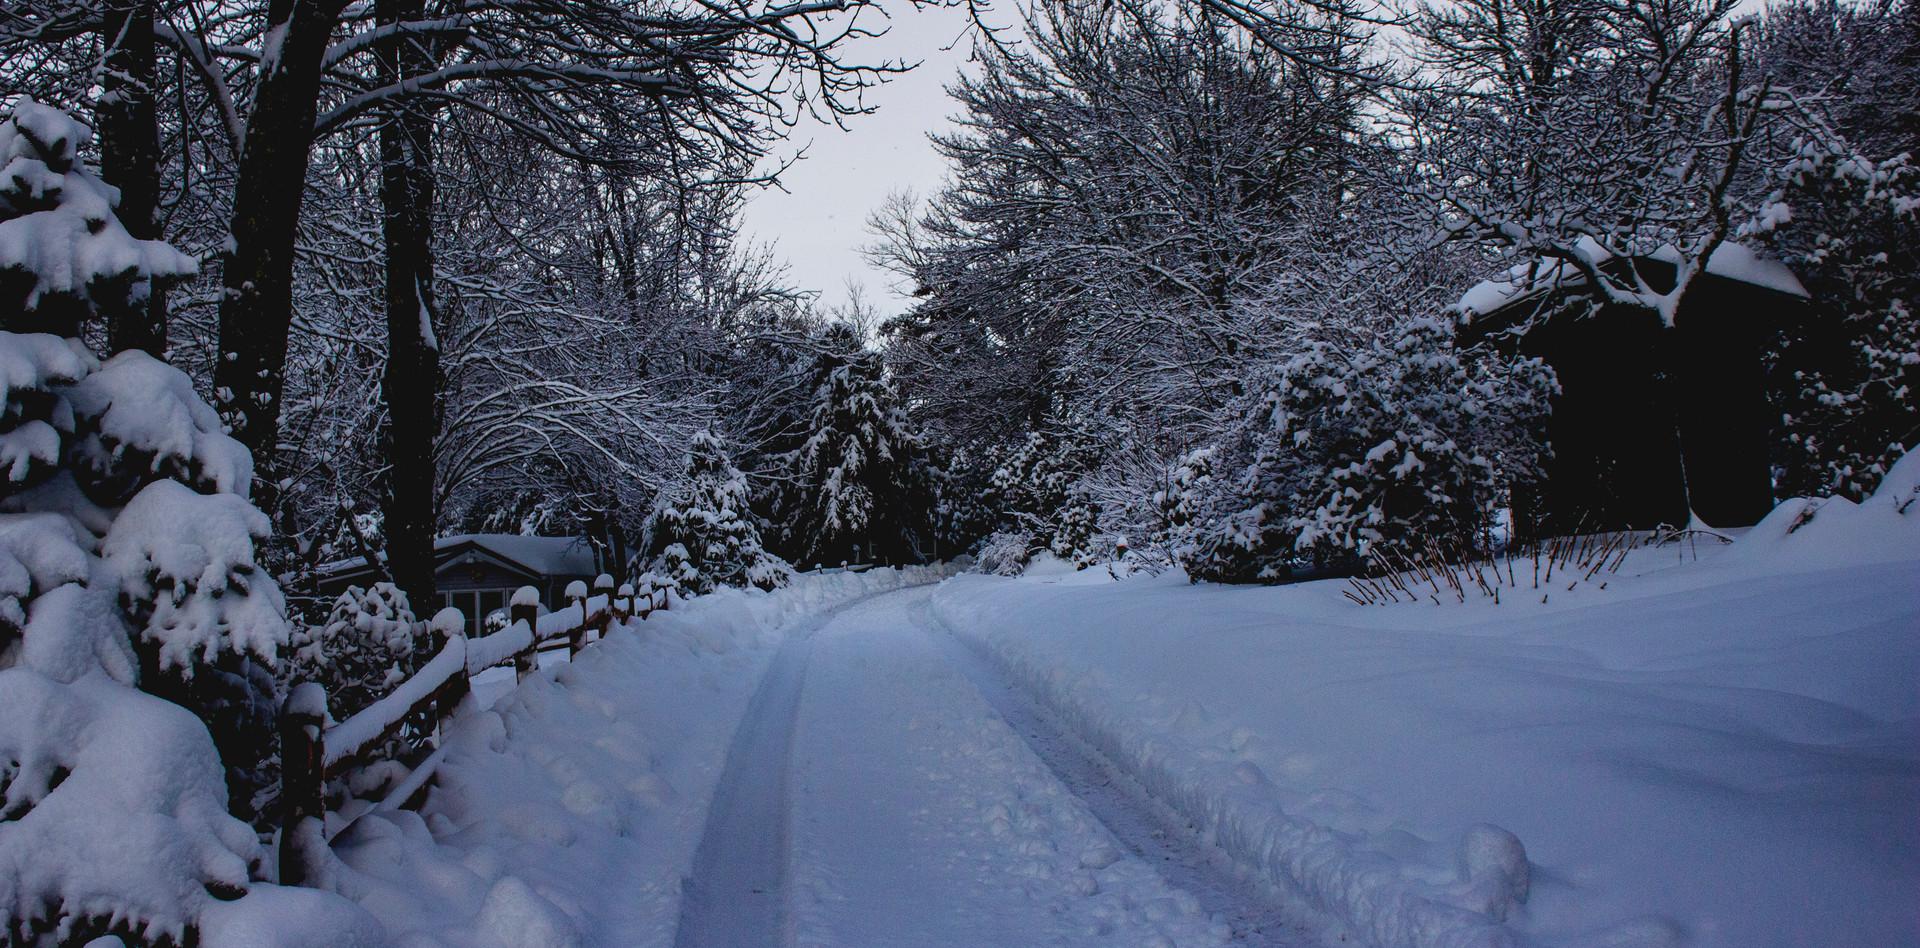 Wintry Lane